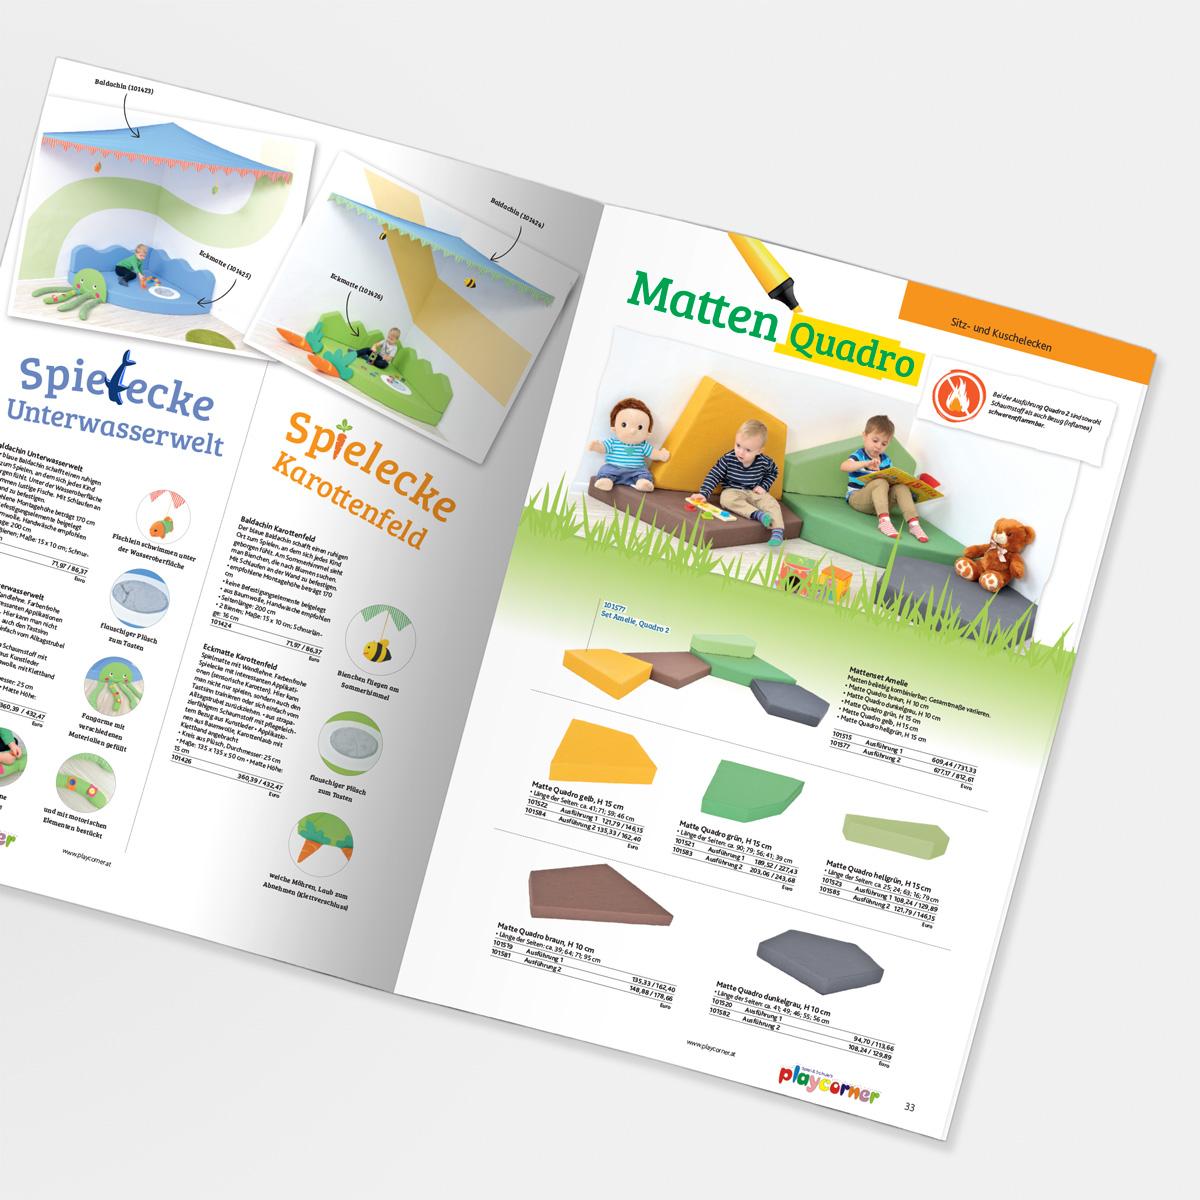 Spiel schule artina design for Design schule